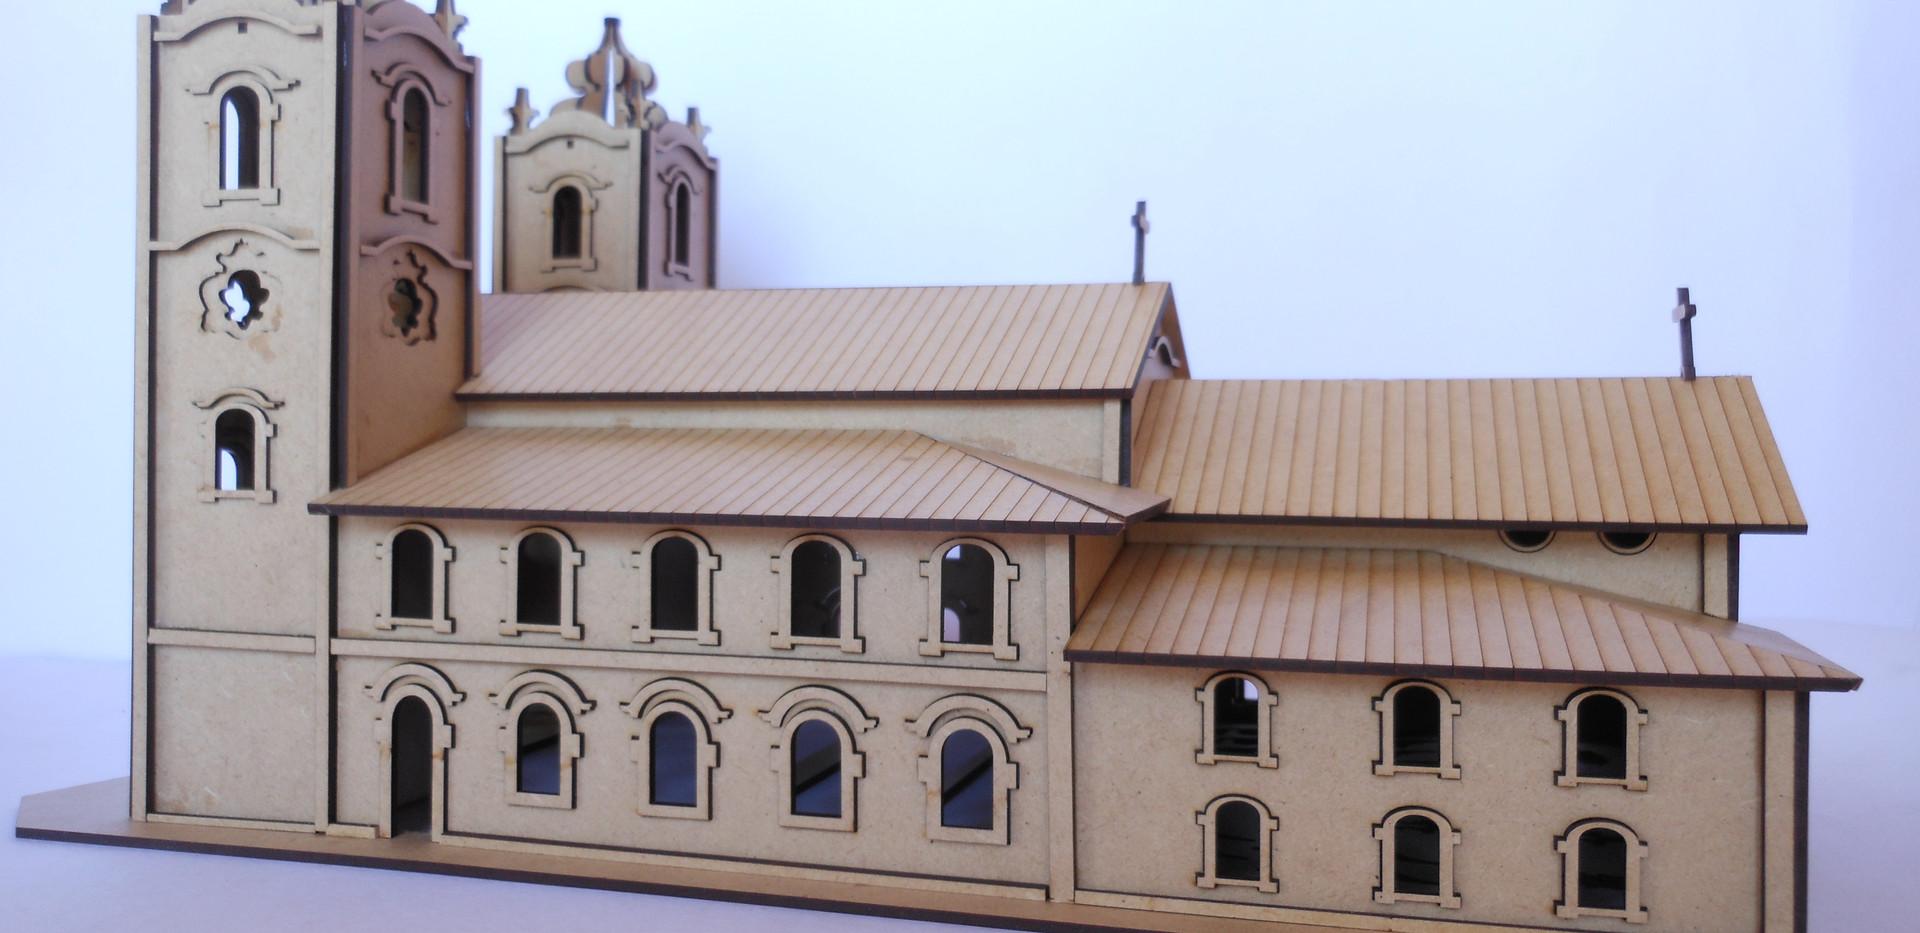 Igrejas barrocas